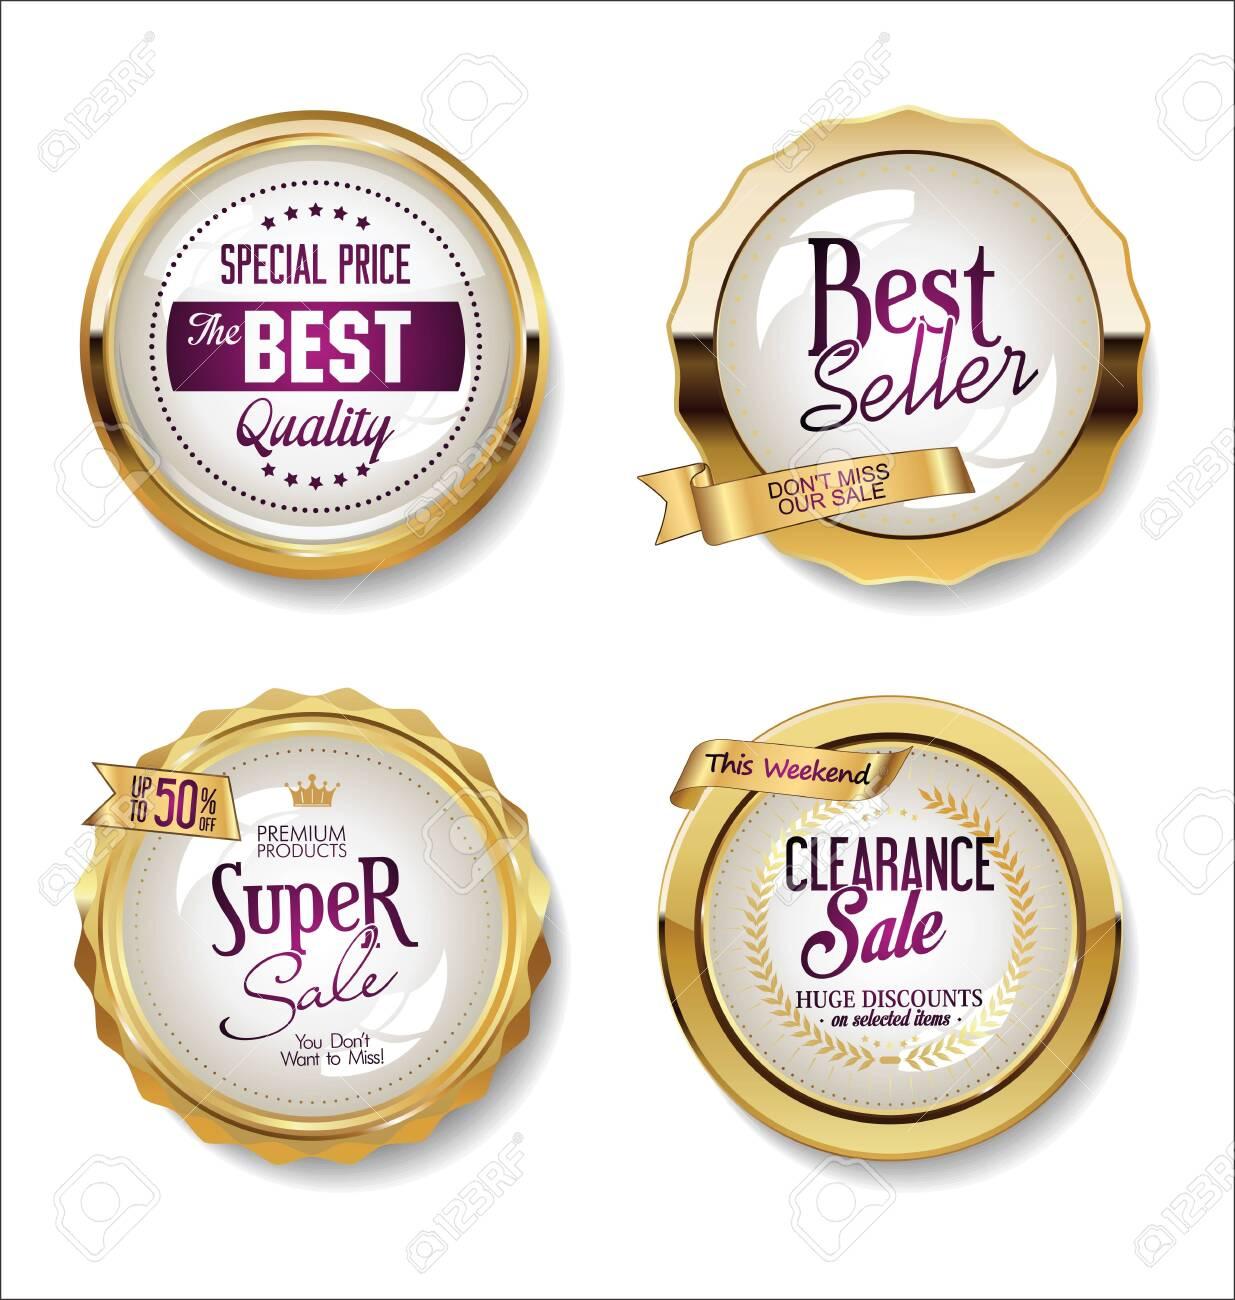 Luxury premium golden badges and labels - 135122947